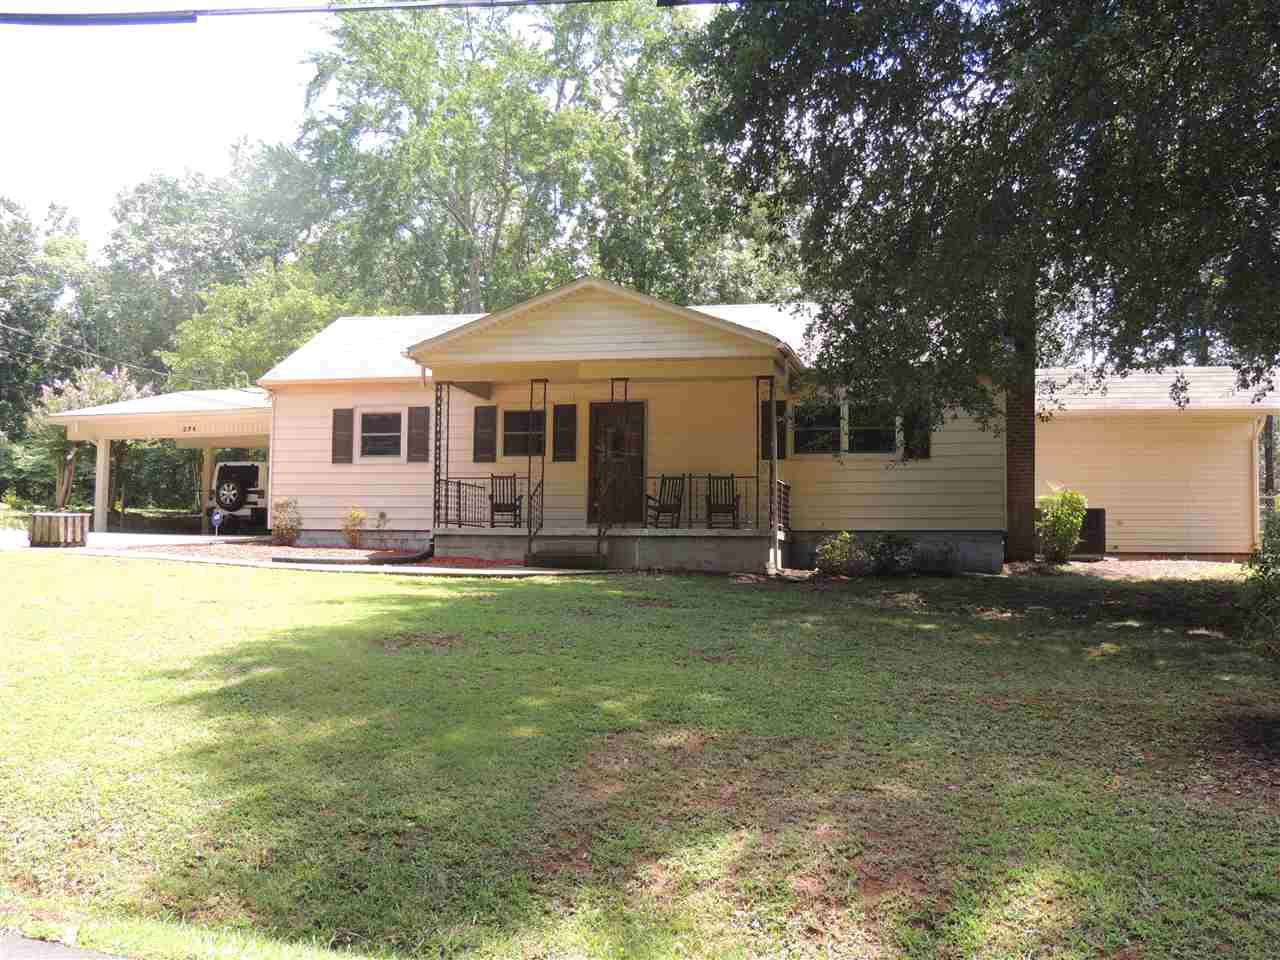 324 Collett St., Rutherfordton, NC 28139